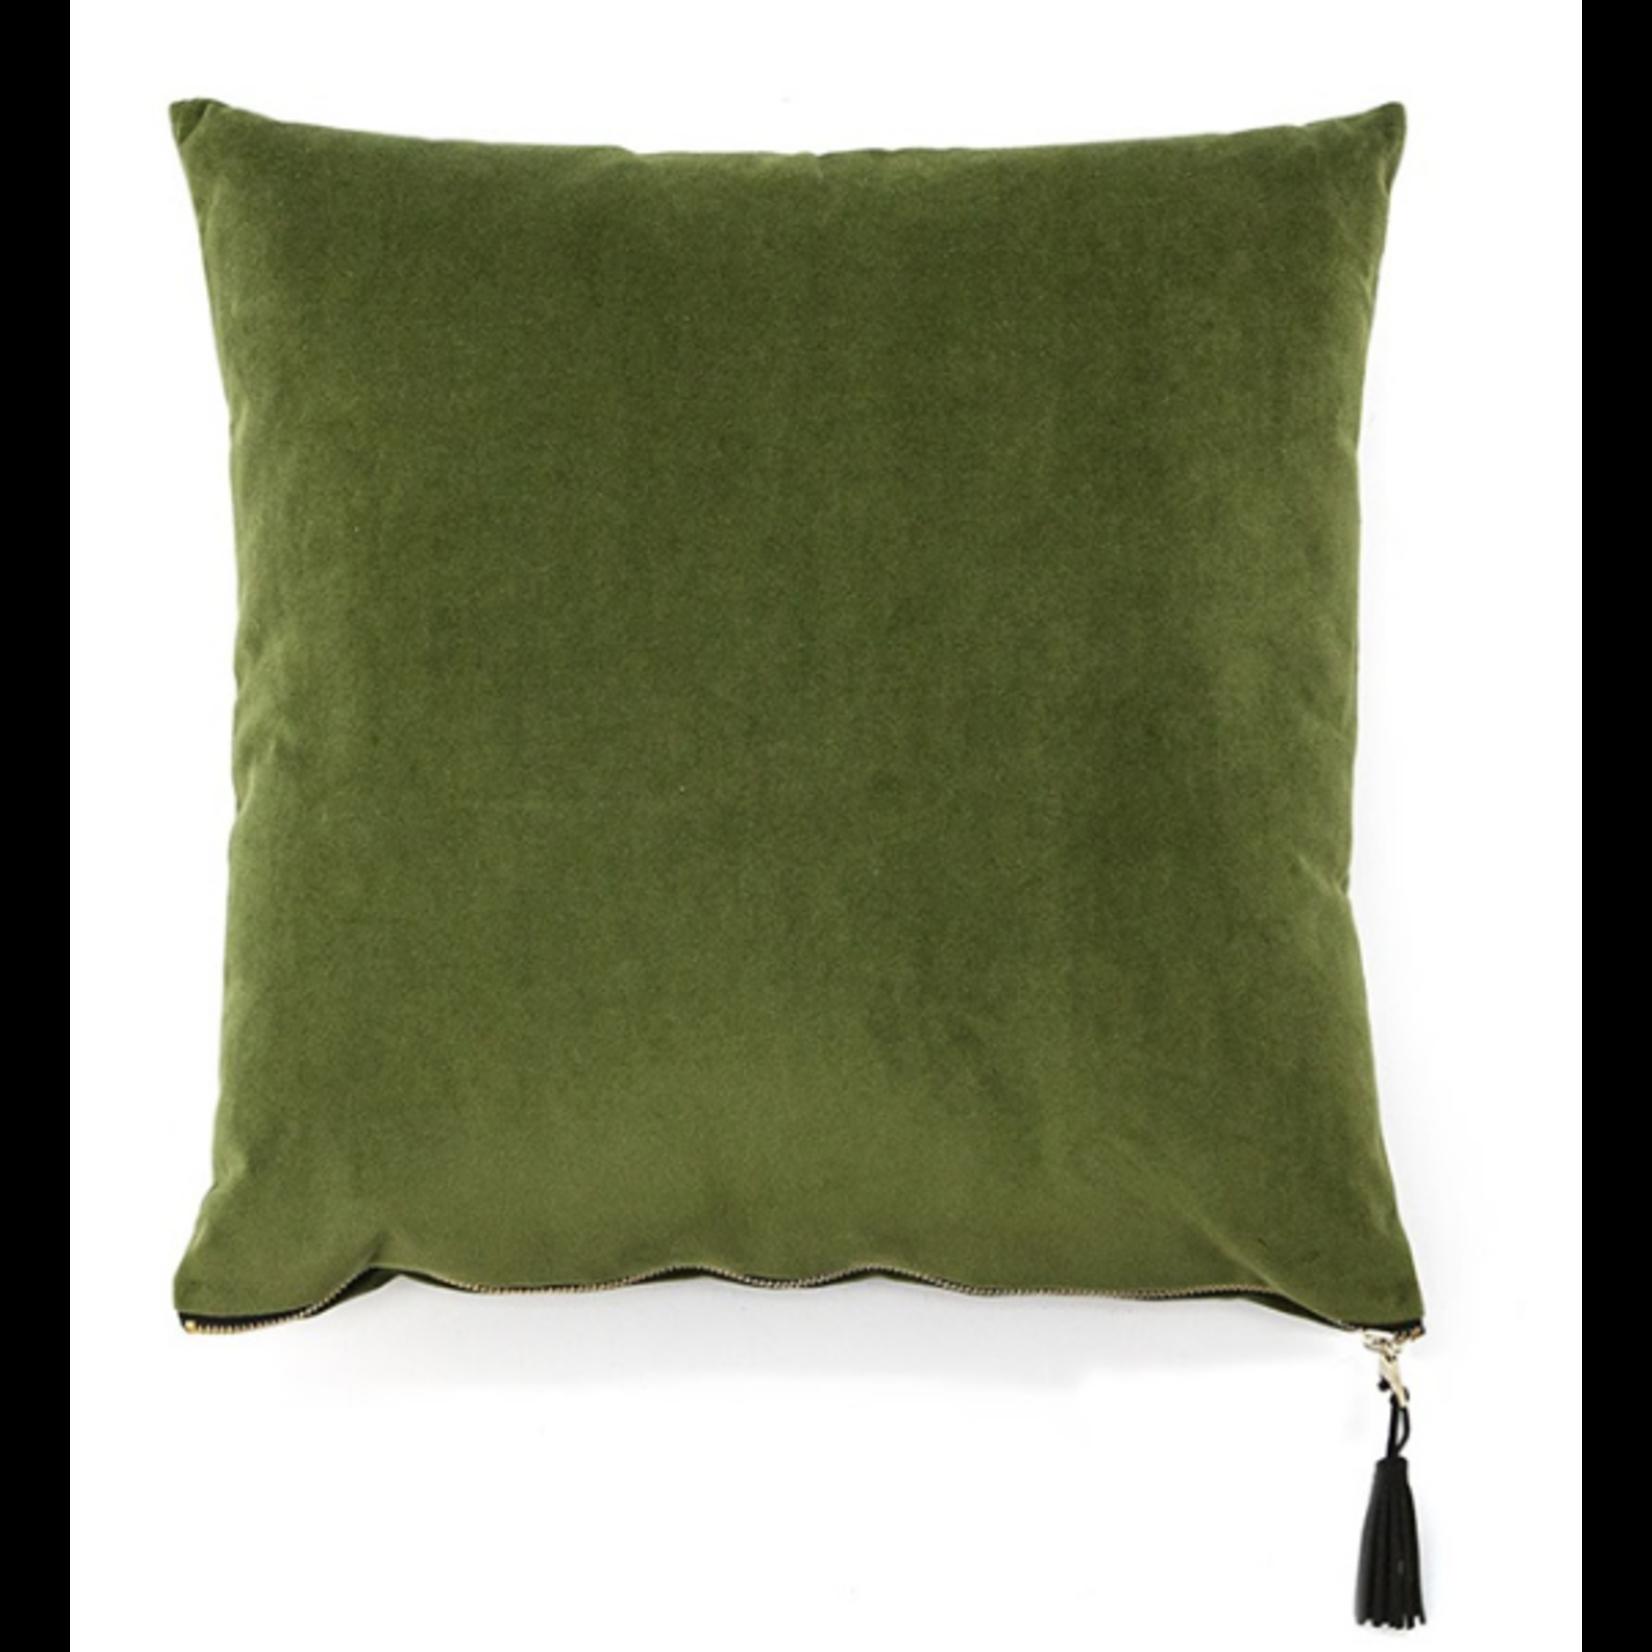 By Boo Stuart 45x45 cm - green